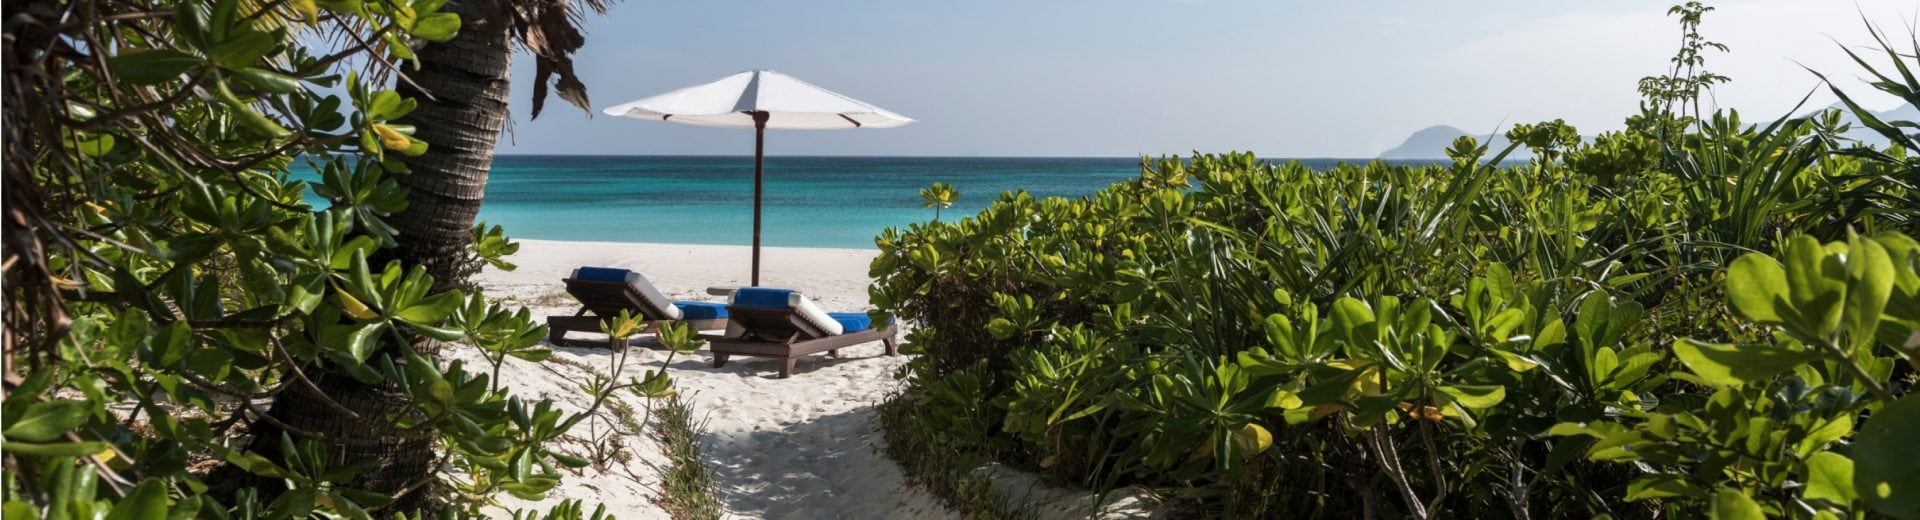 Amanpulo beach resort sea view